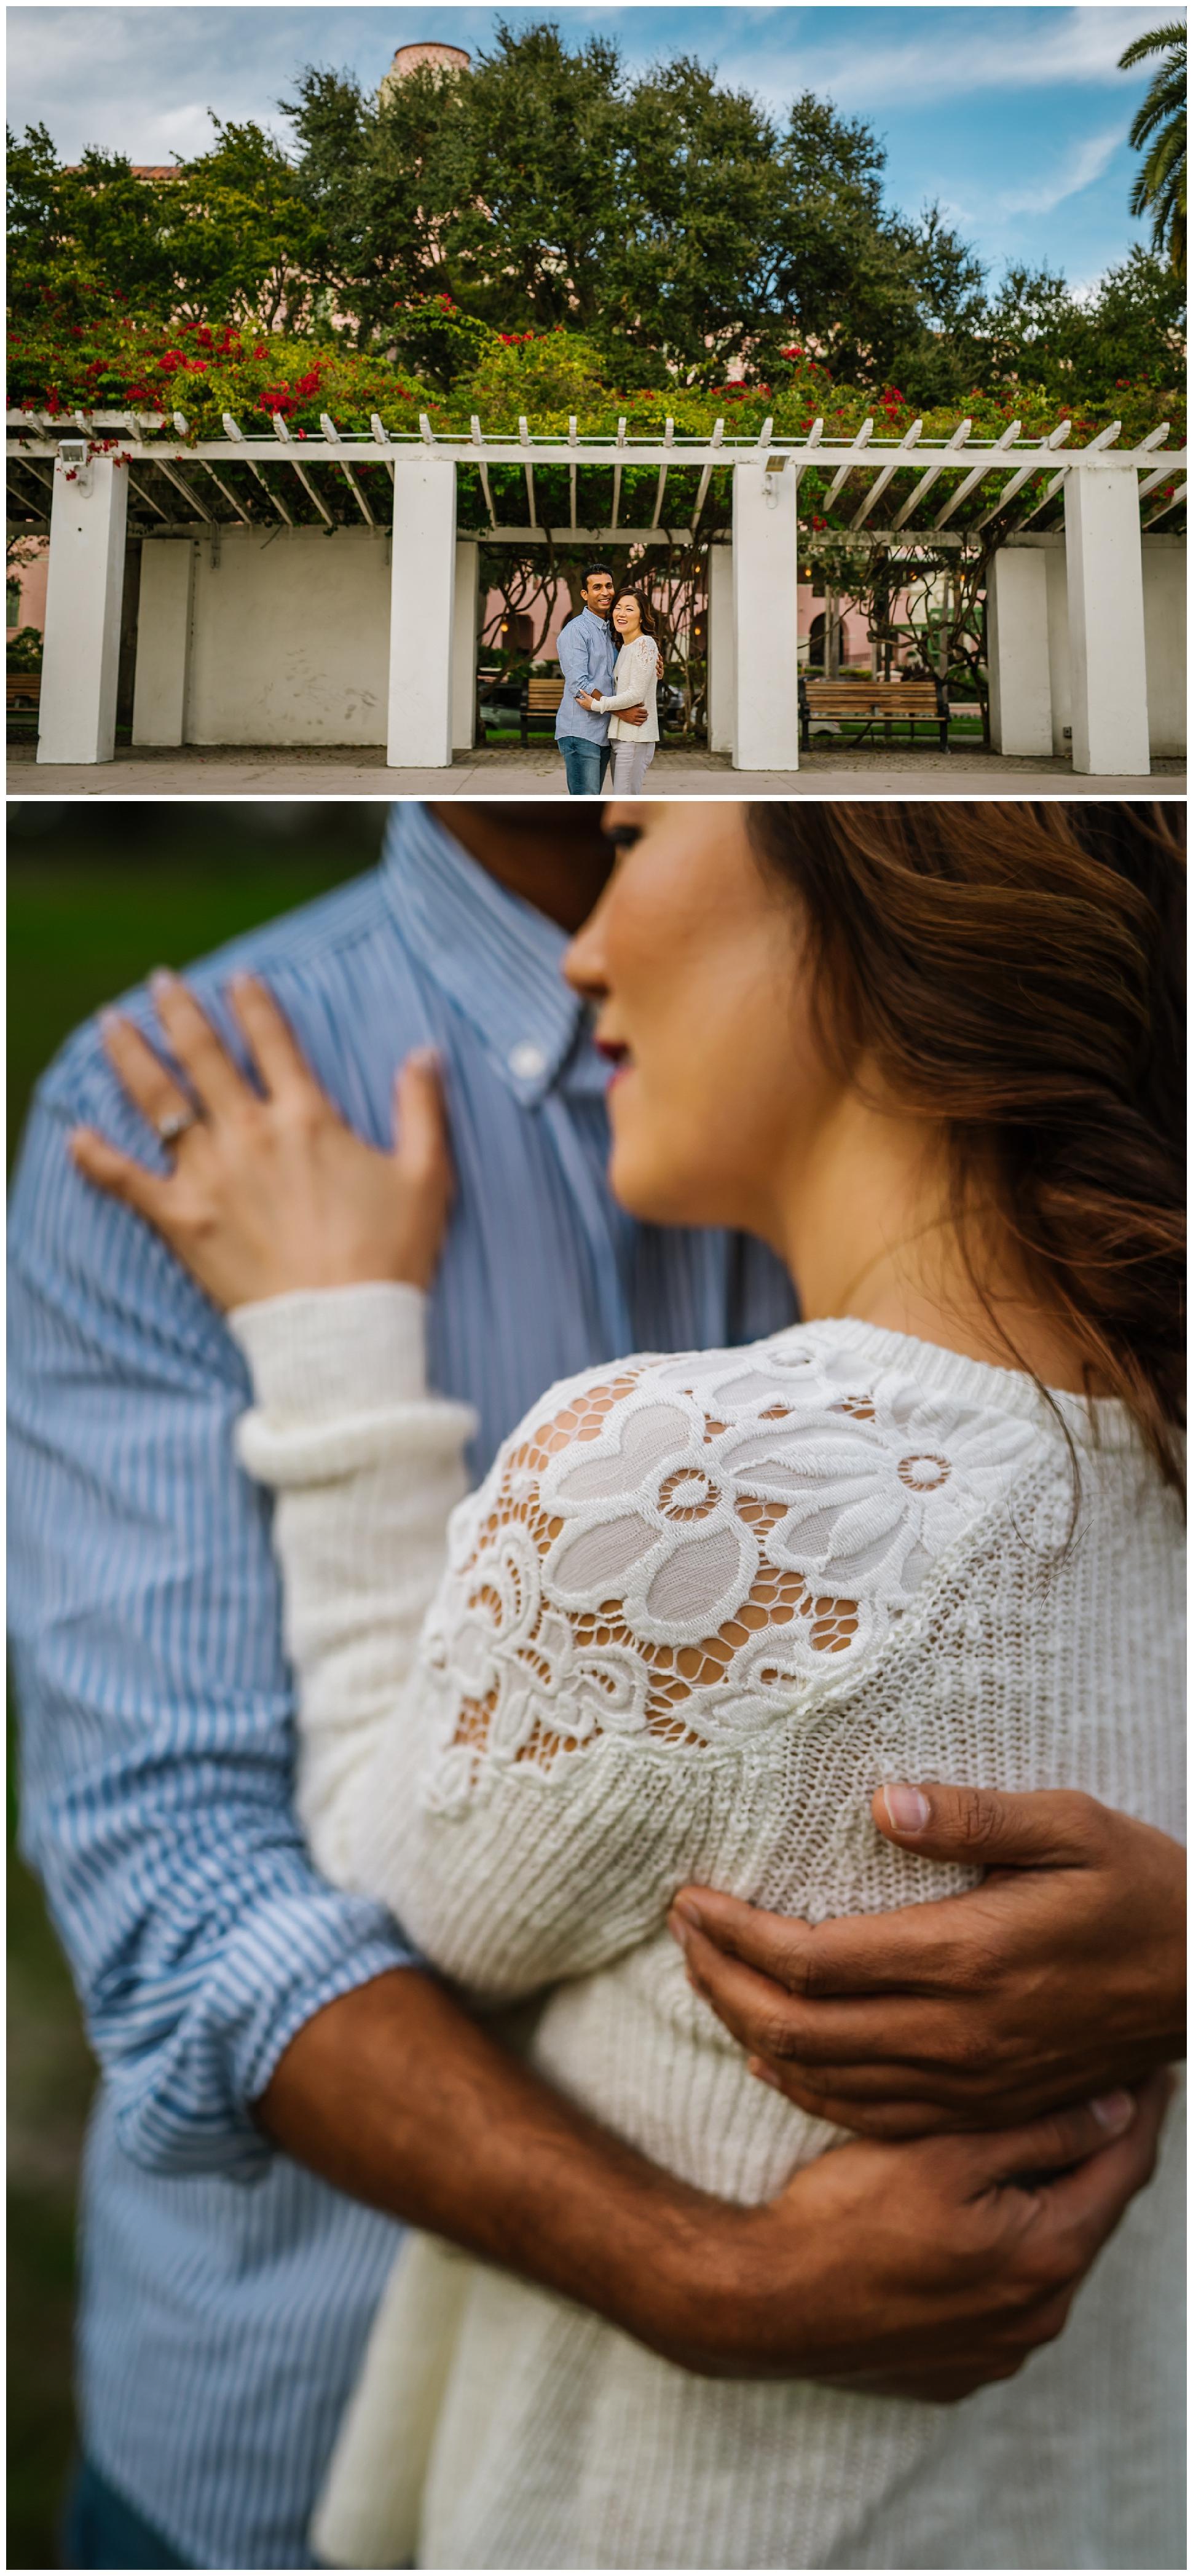 Ashlee-hamon-photography-year-in-review-2016-travel-wanderlust-vsco-adventure-wedding_0037.jpg